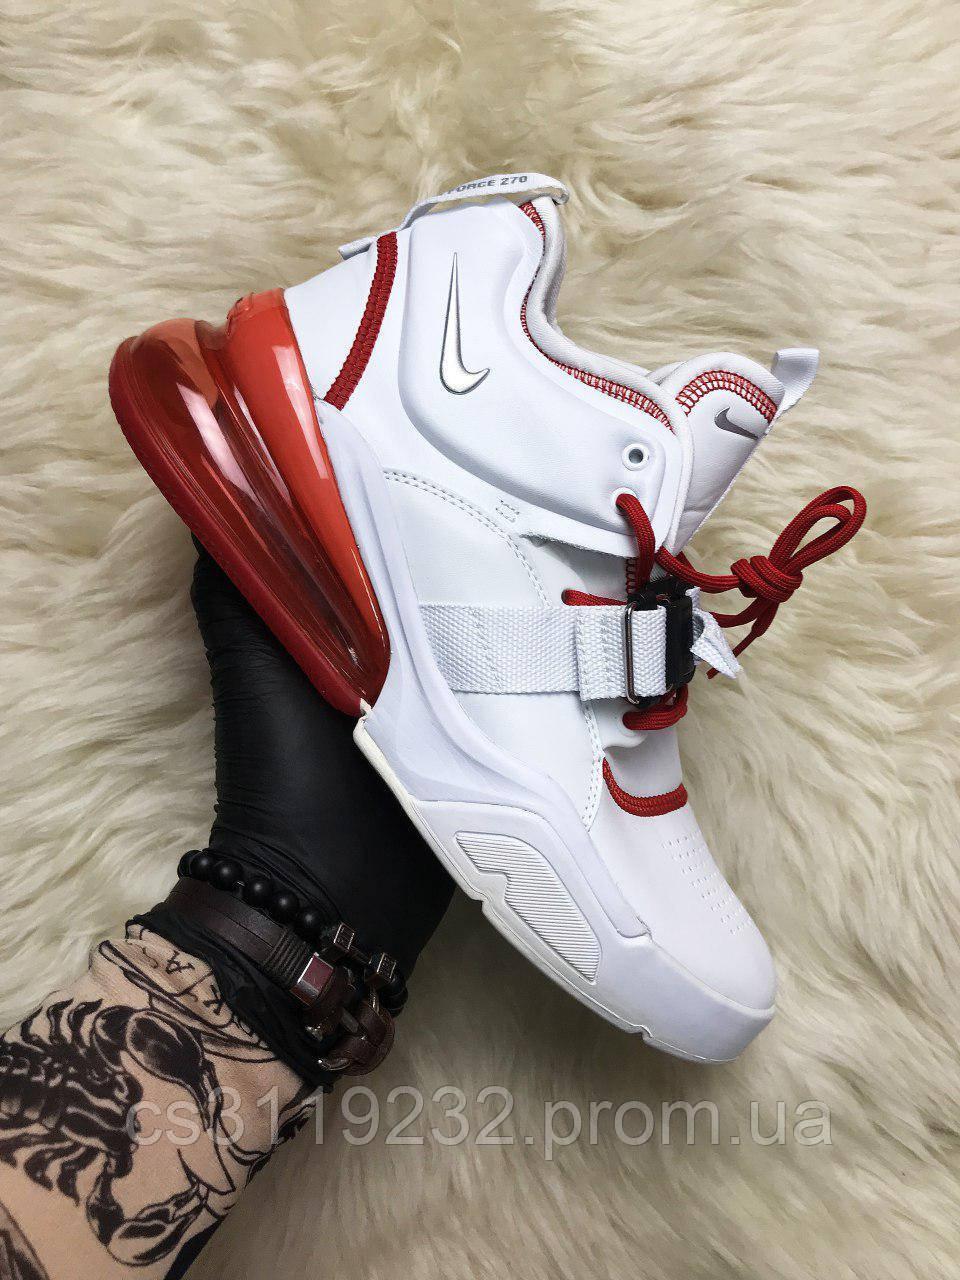 Мужские кроссовки Nike Air Force 270 (белые)